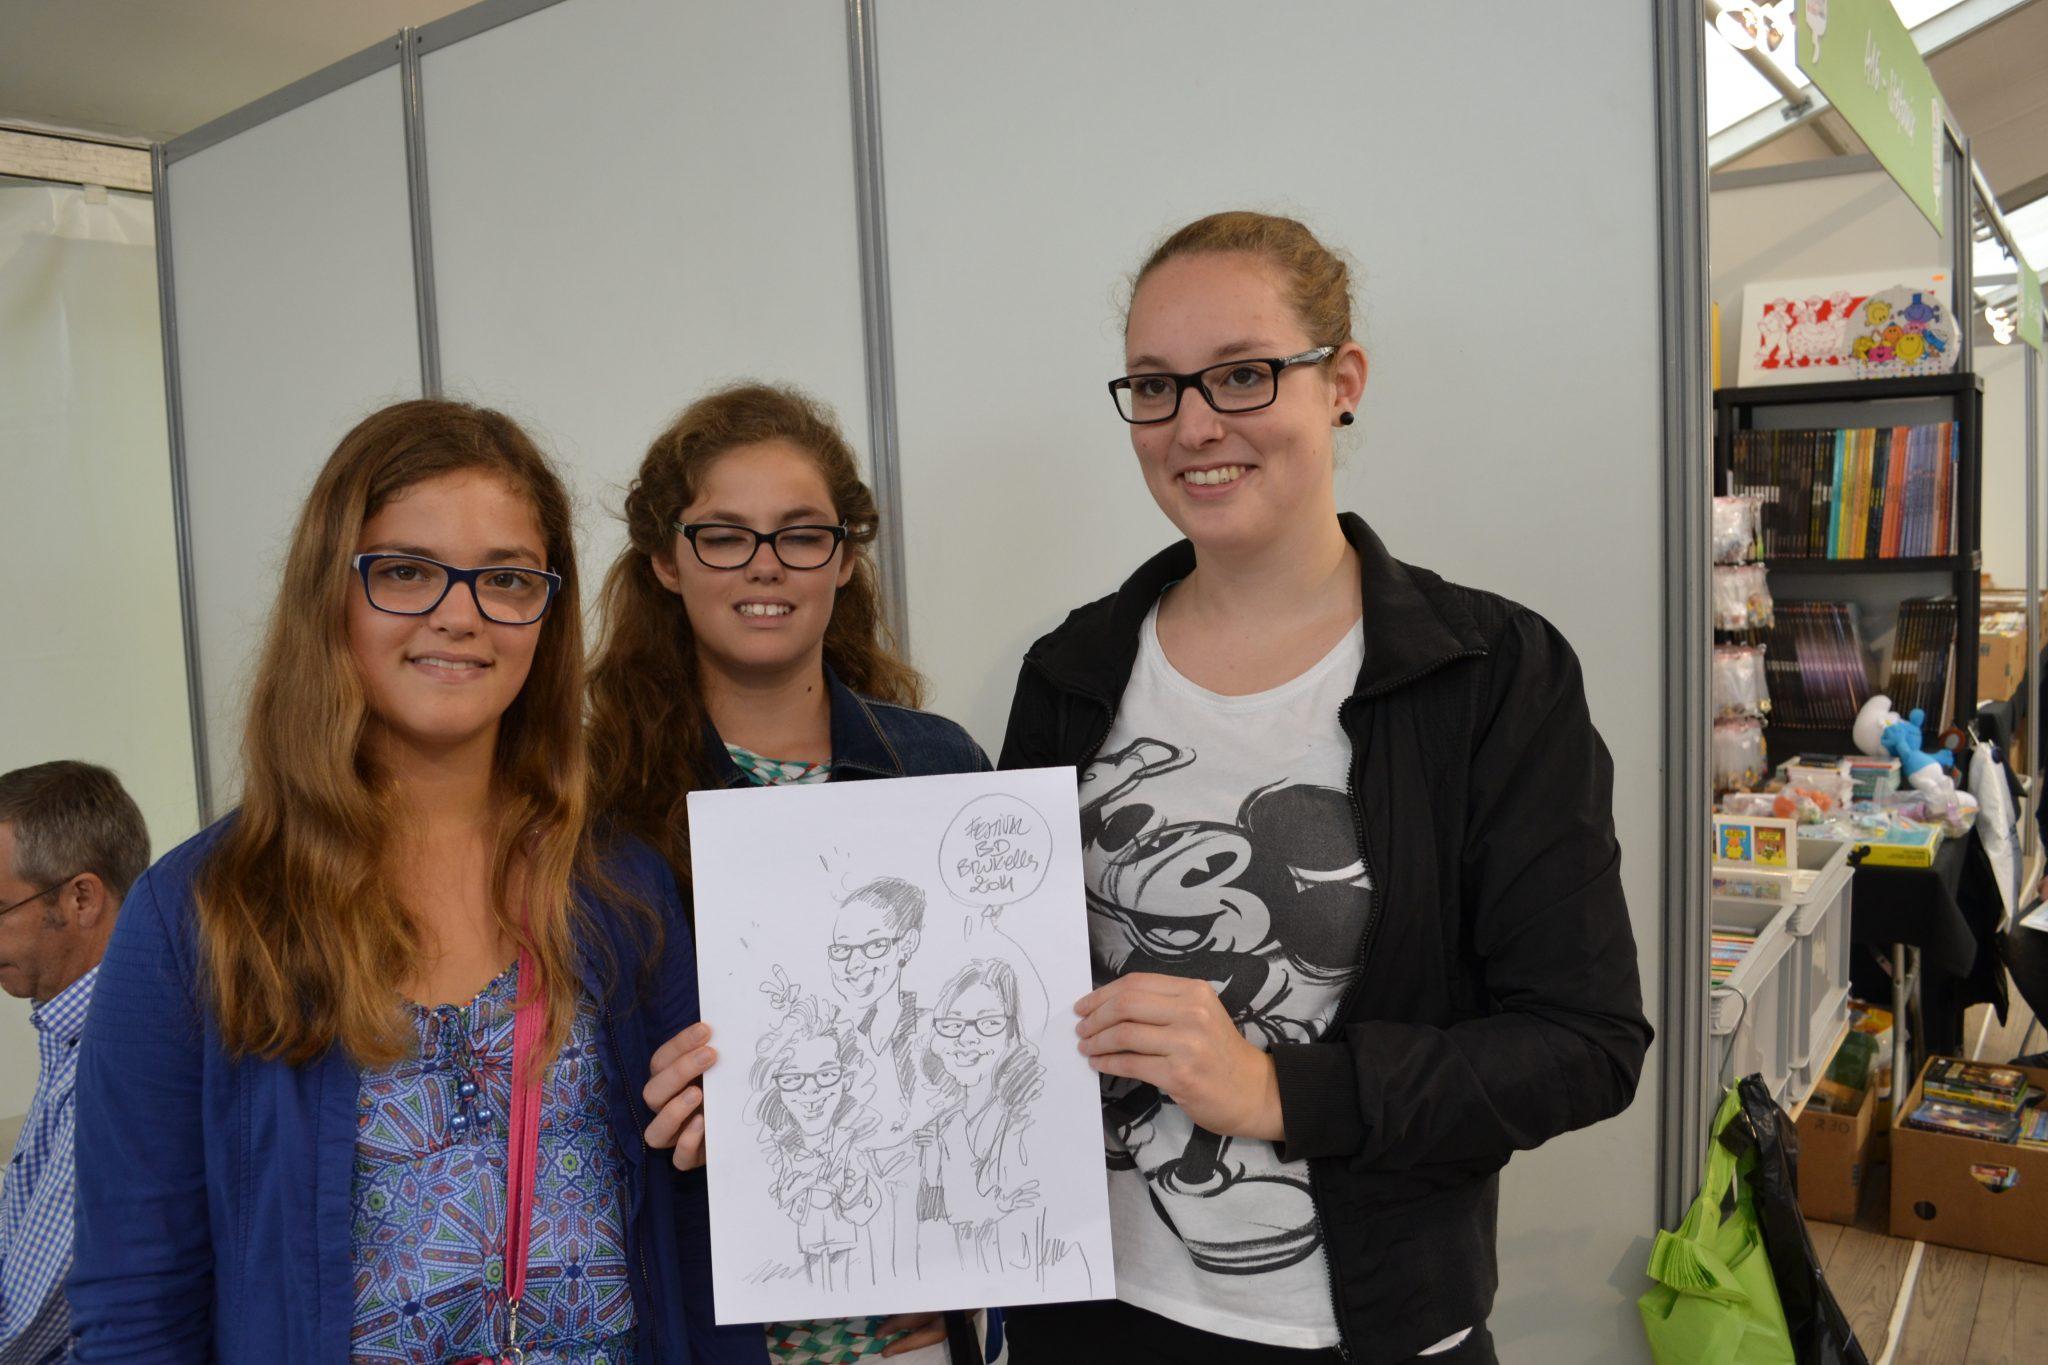 Comicfestival Brüssel - dsc 0020